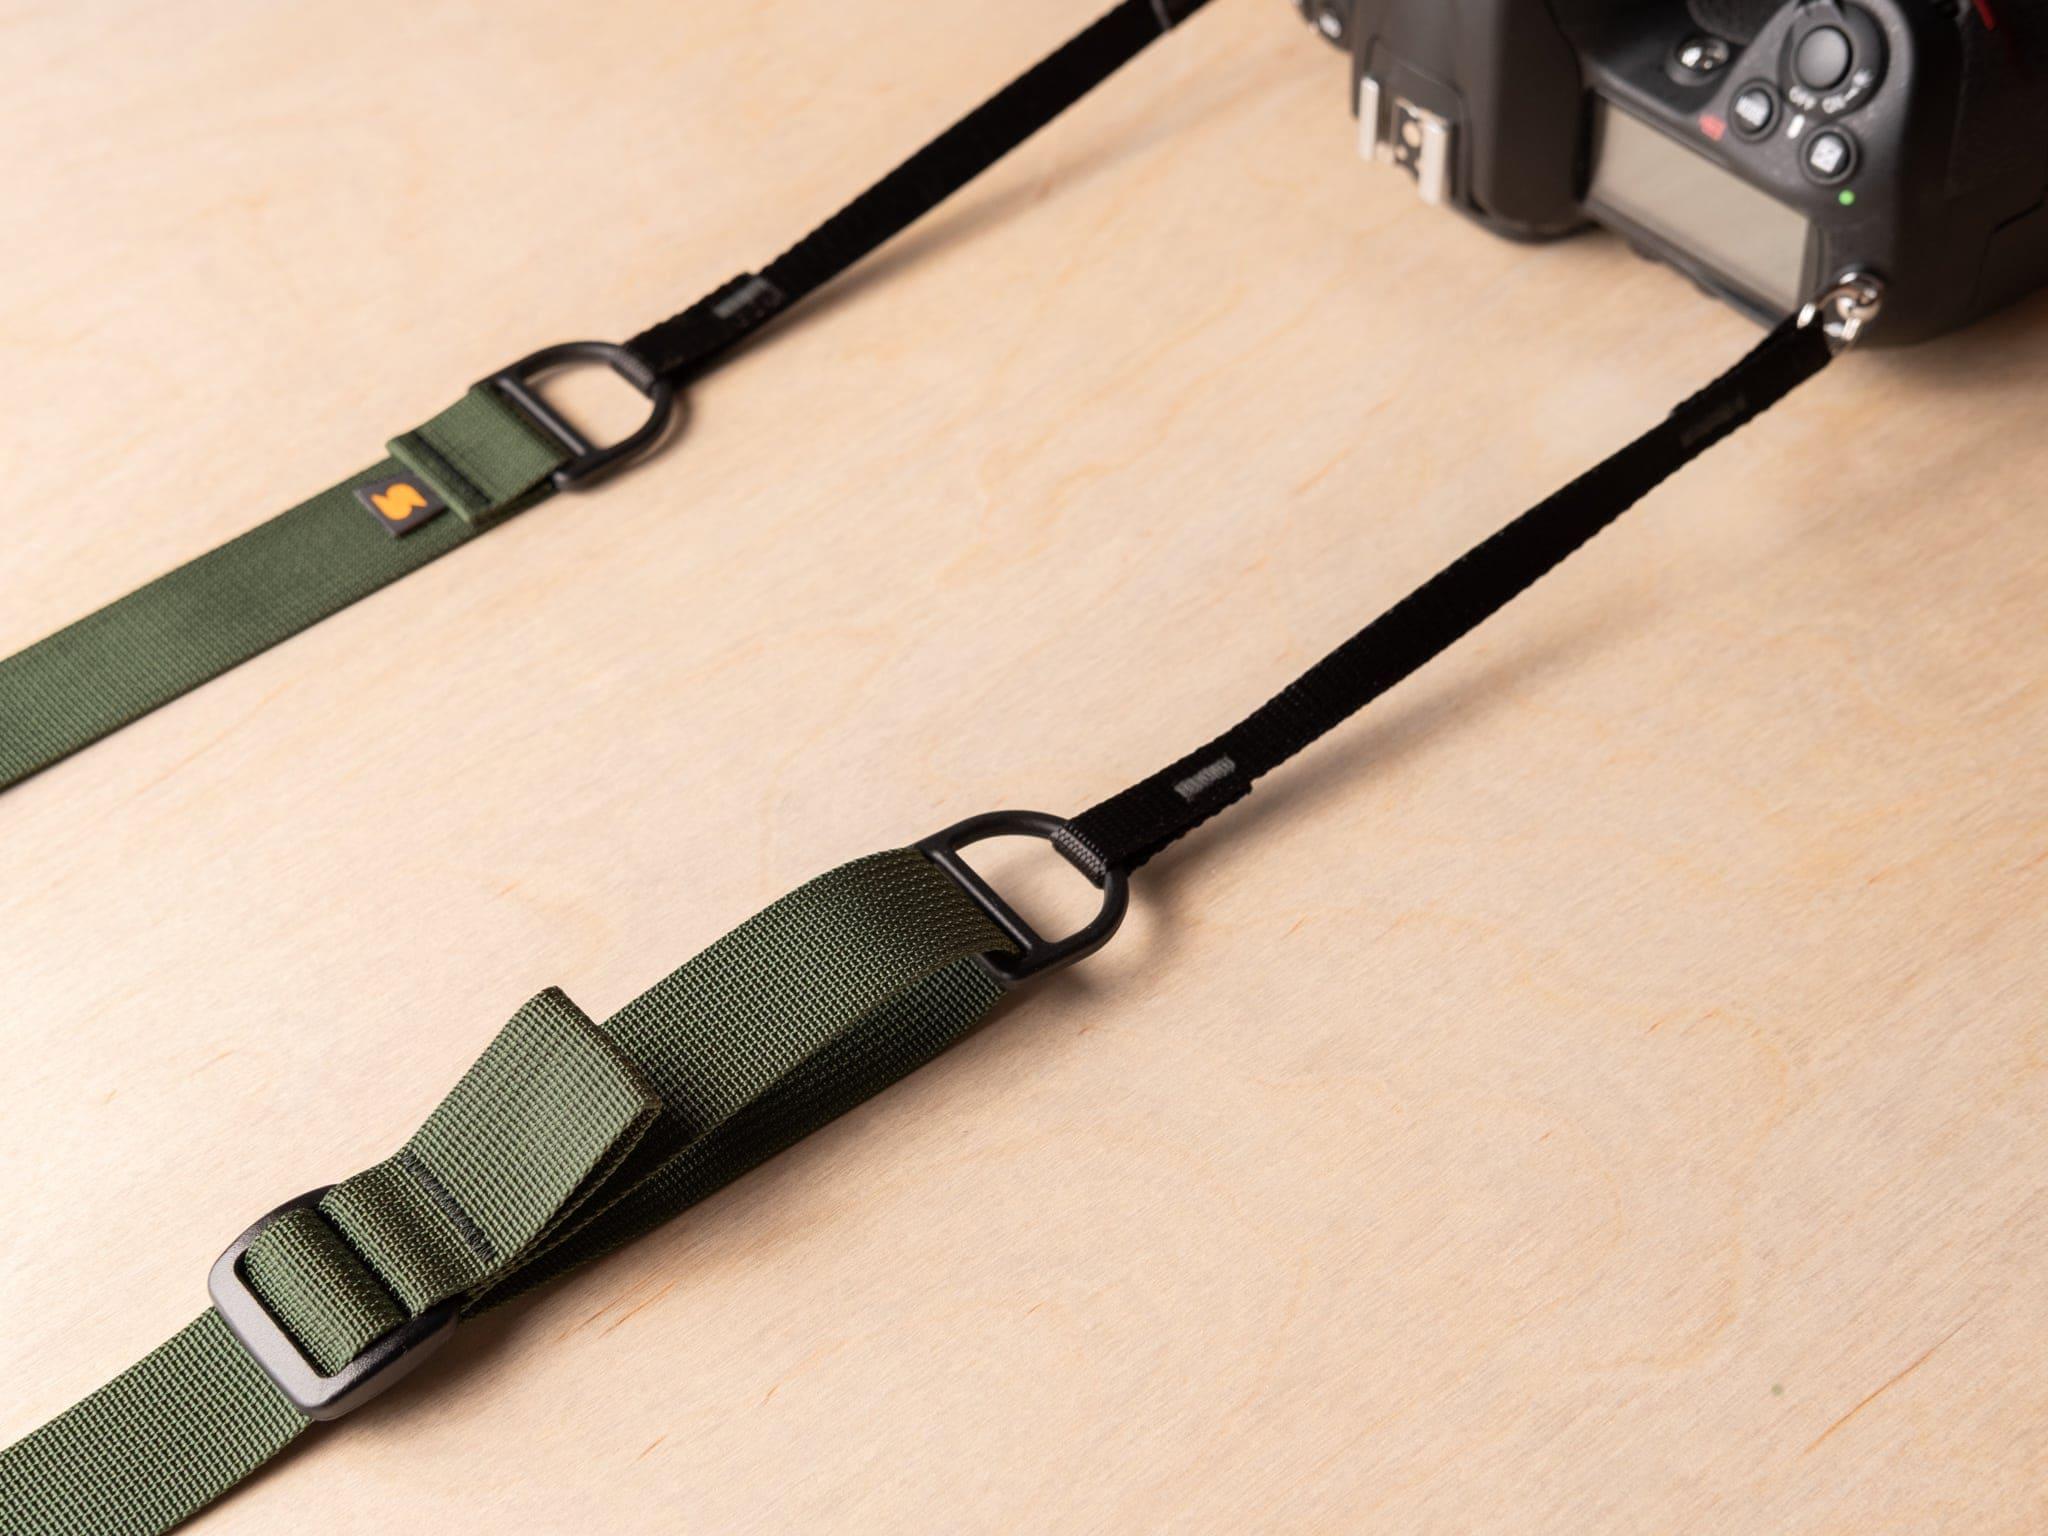 Simplr F1 Camera Sling Strap on Nikon DSLR